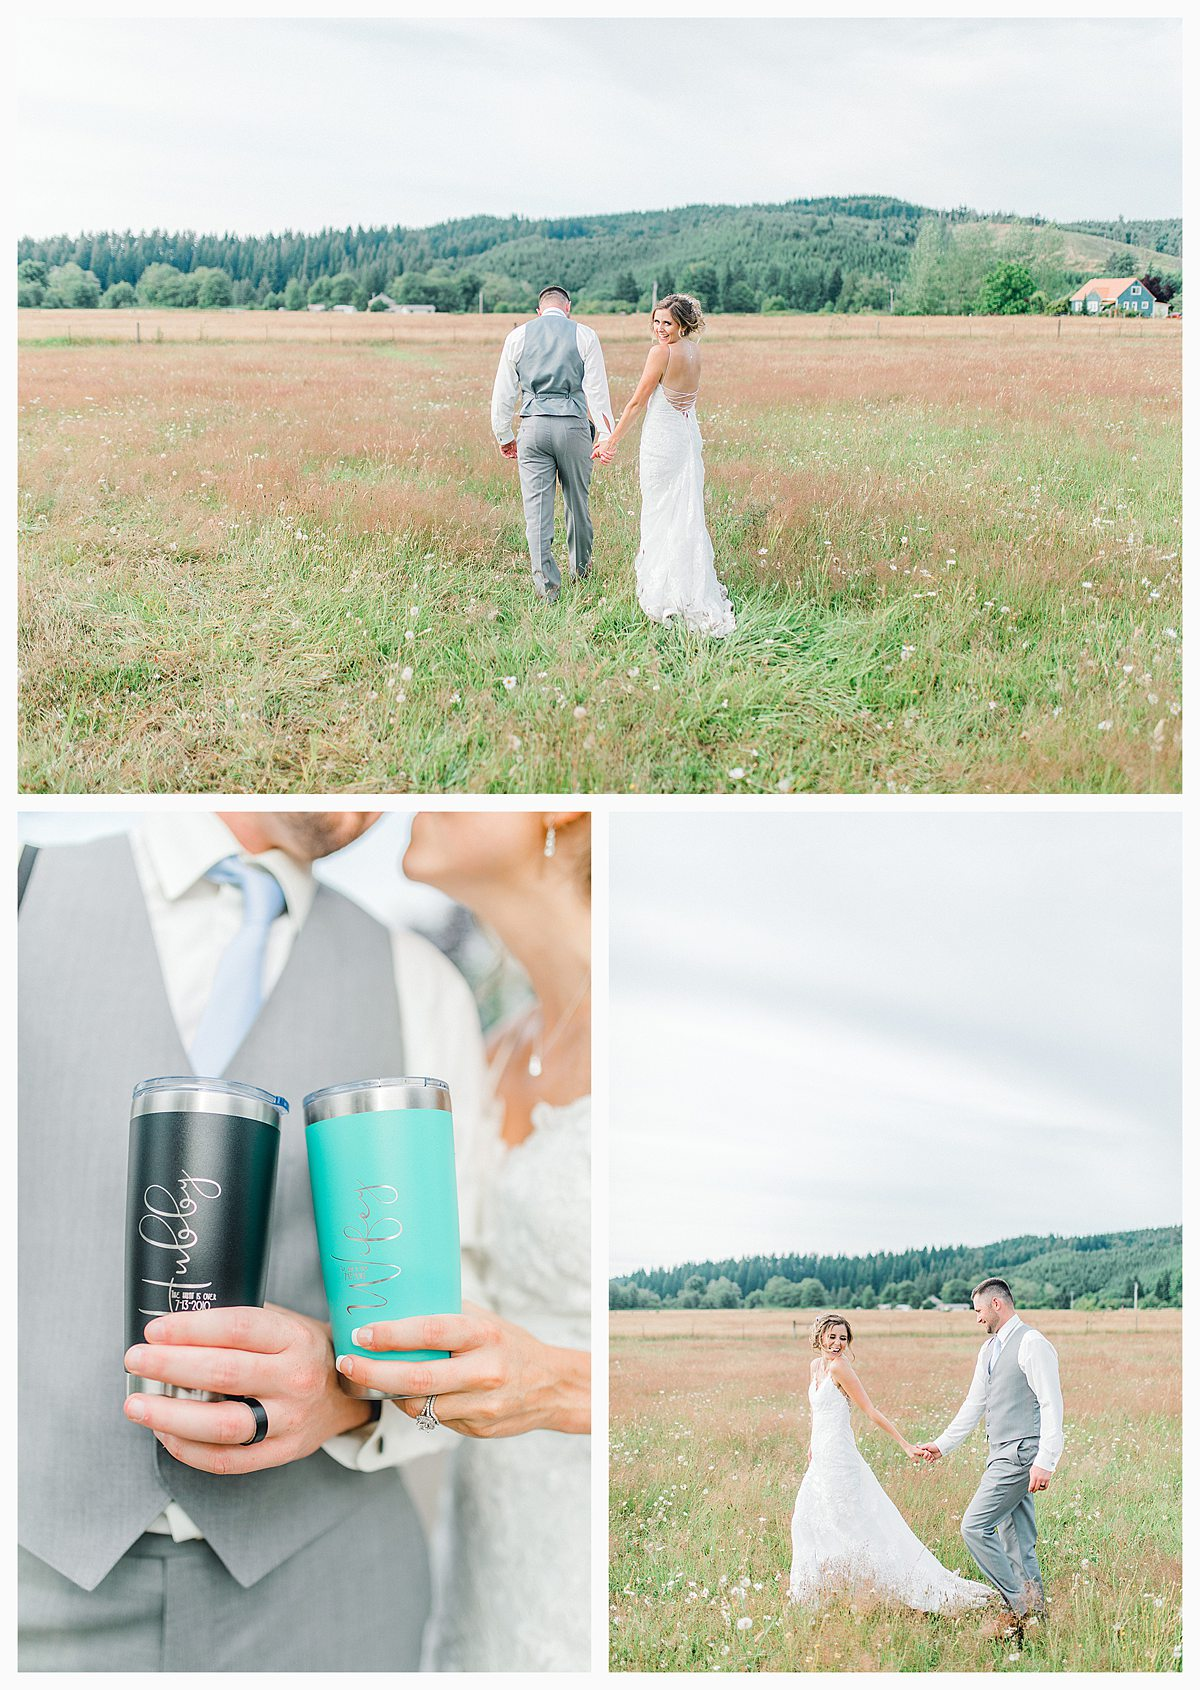 Rustic Coastal Blue Wedding in Southwest Washington, Emma Rose Company, Seattle and Portland Wedding Photographer, Light and Airy_0129.jpg